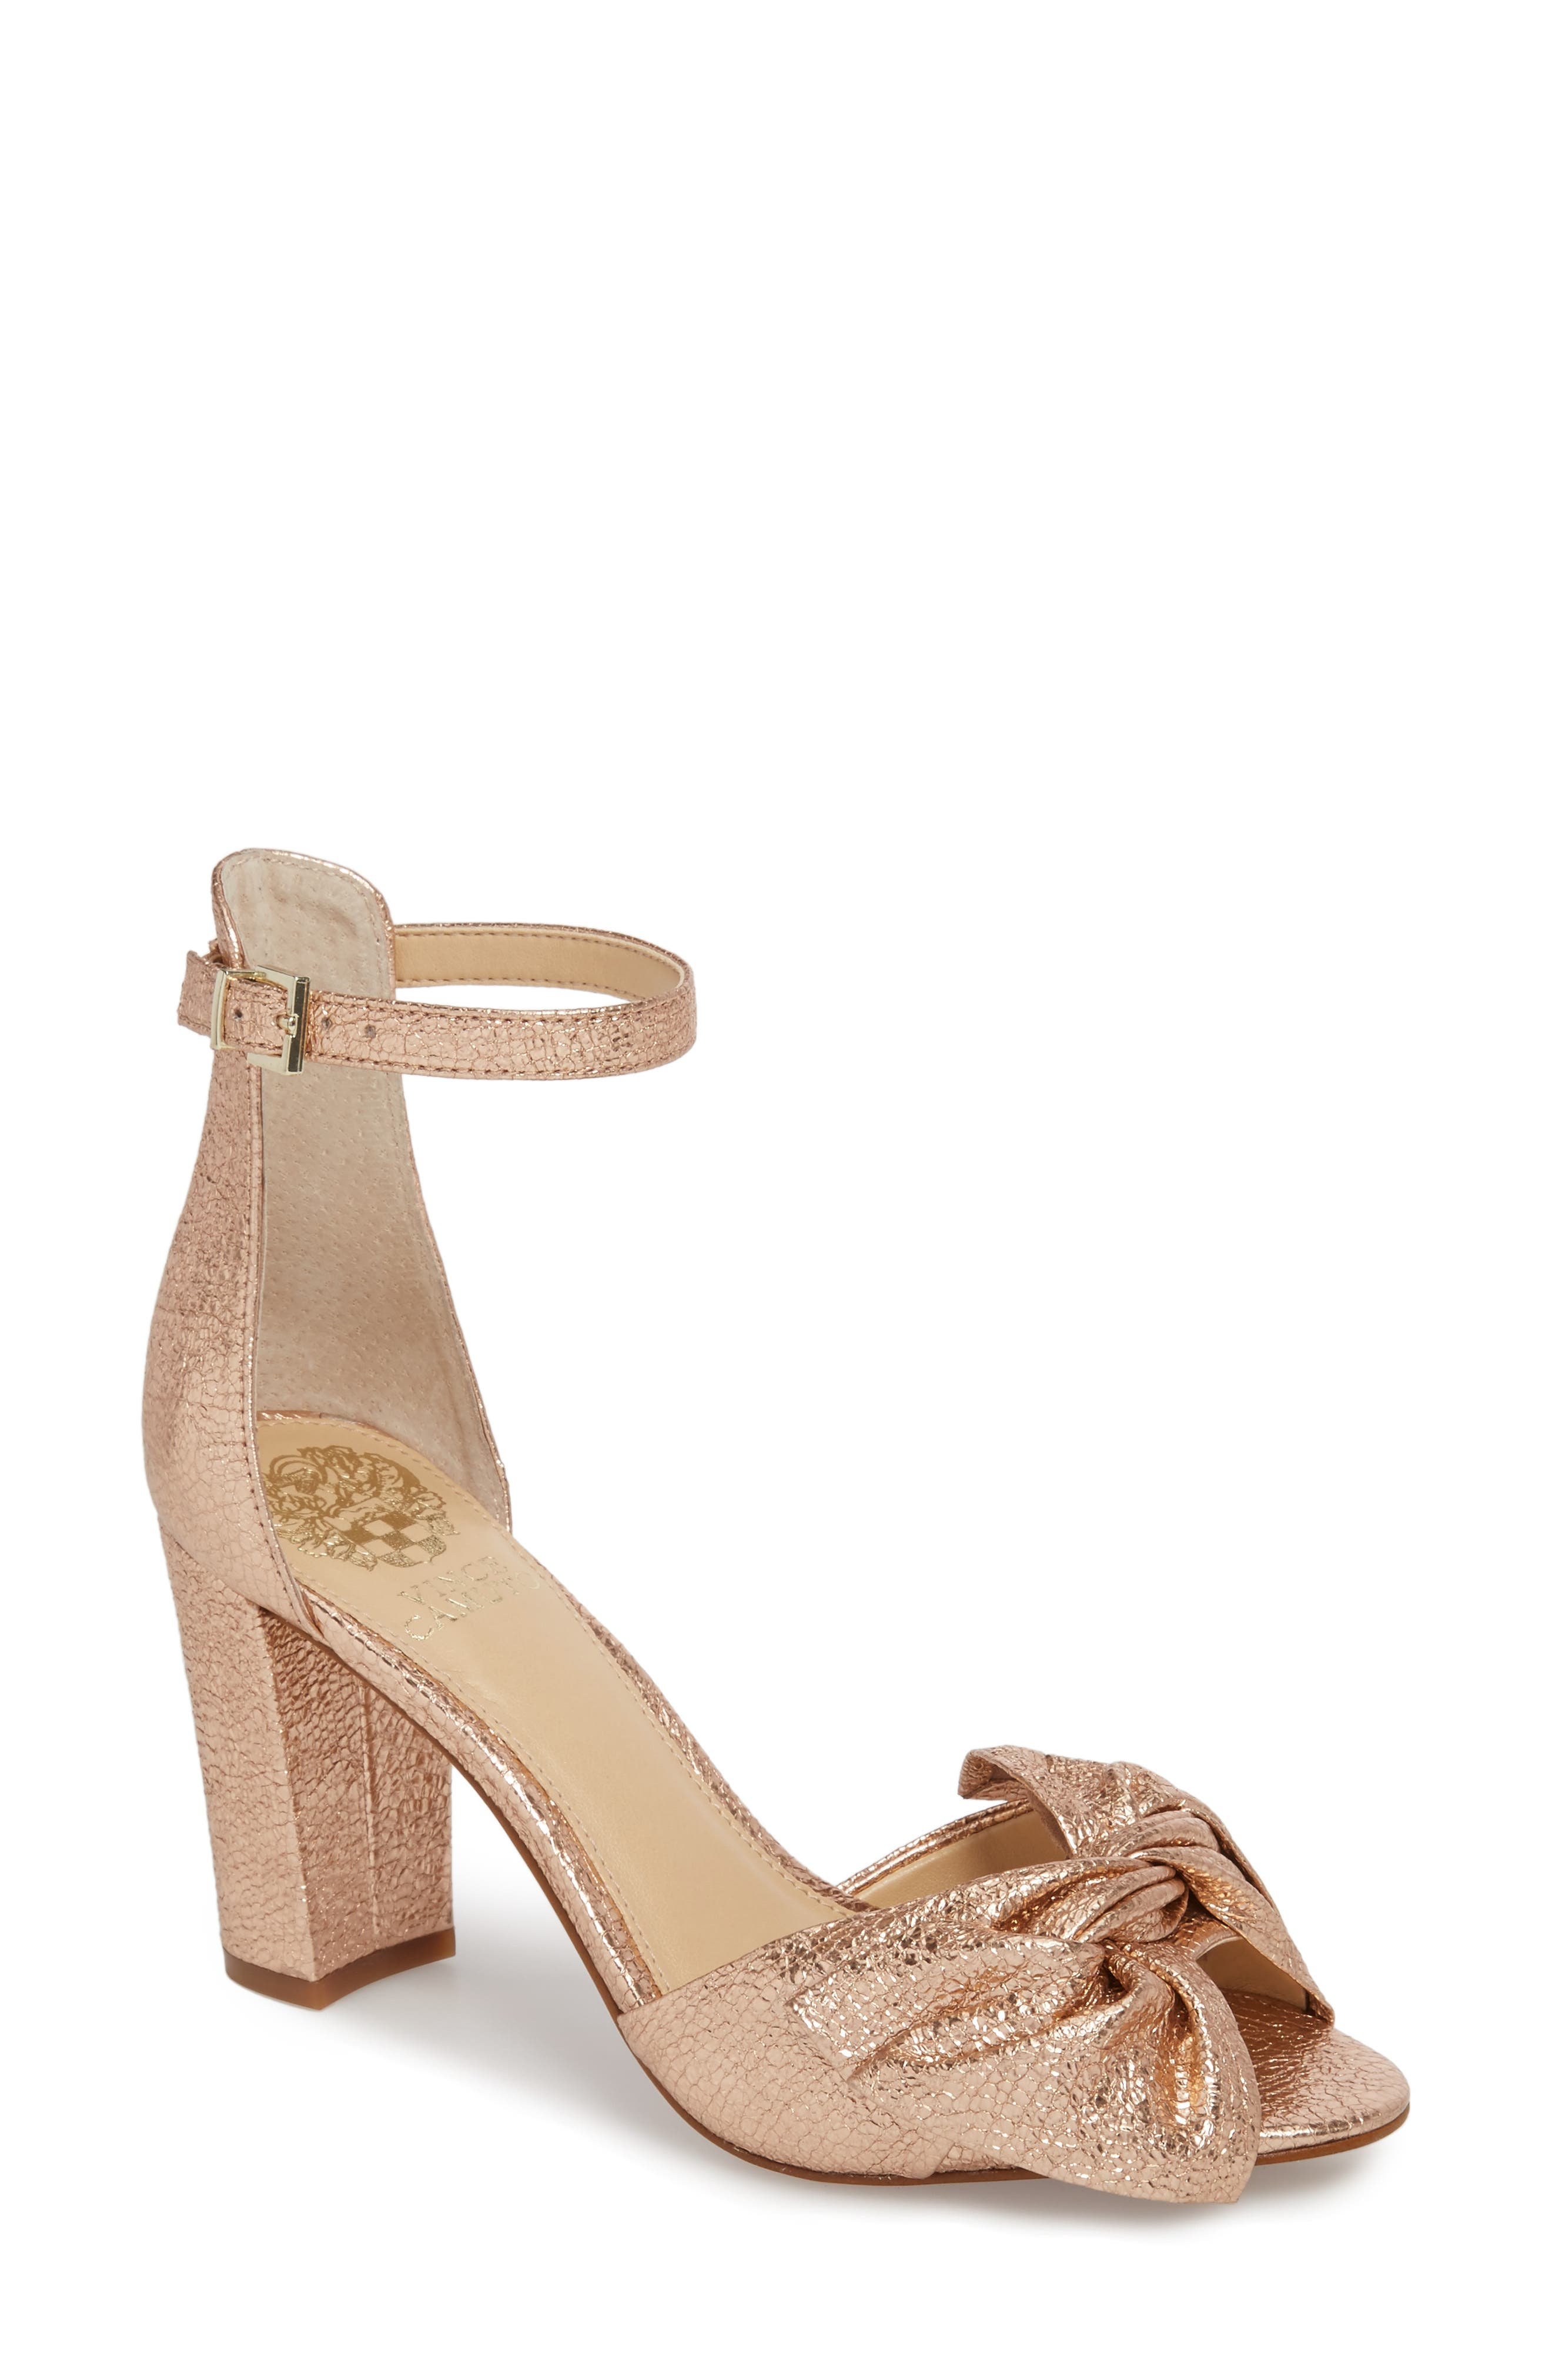 Carrelen Block Heel Sandal,                             Main thumbnail 4, color,